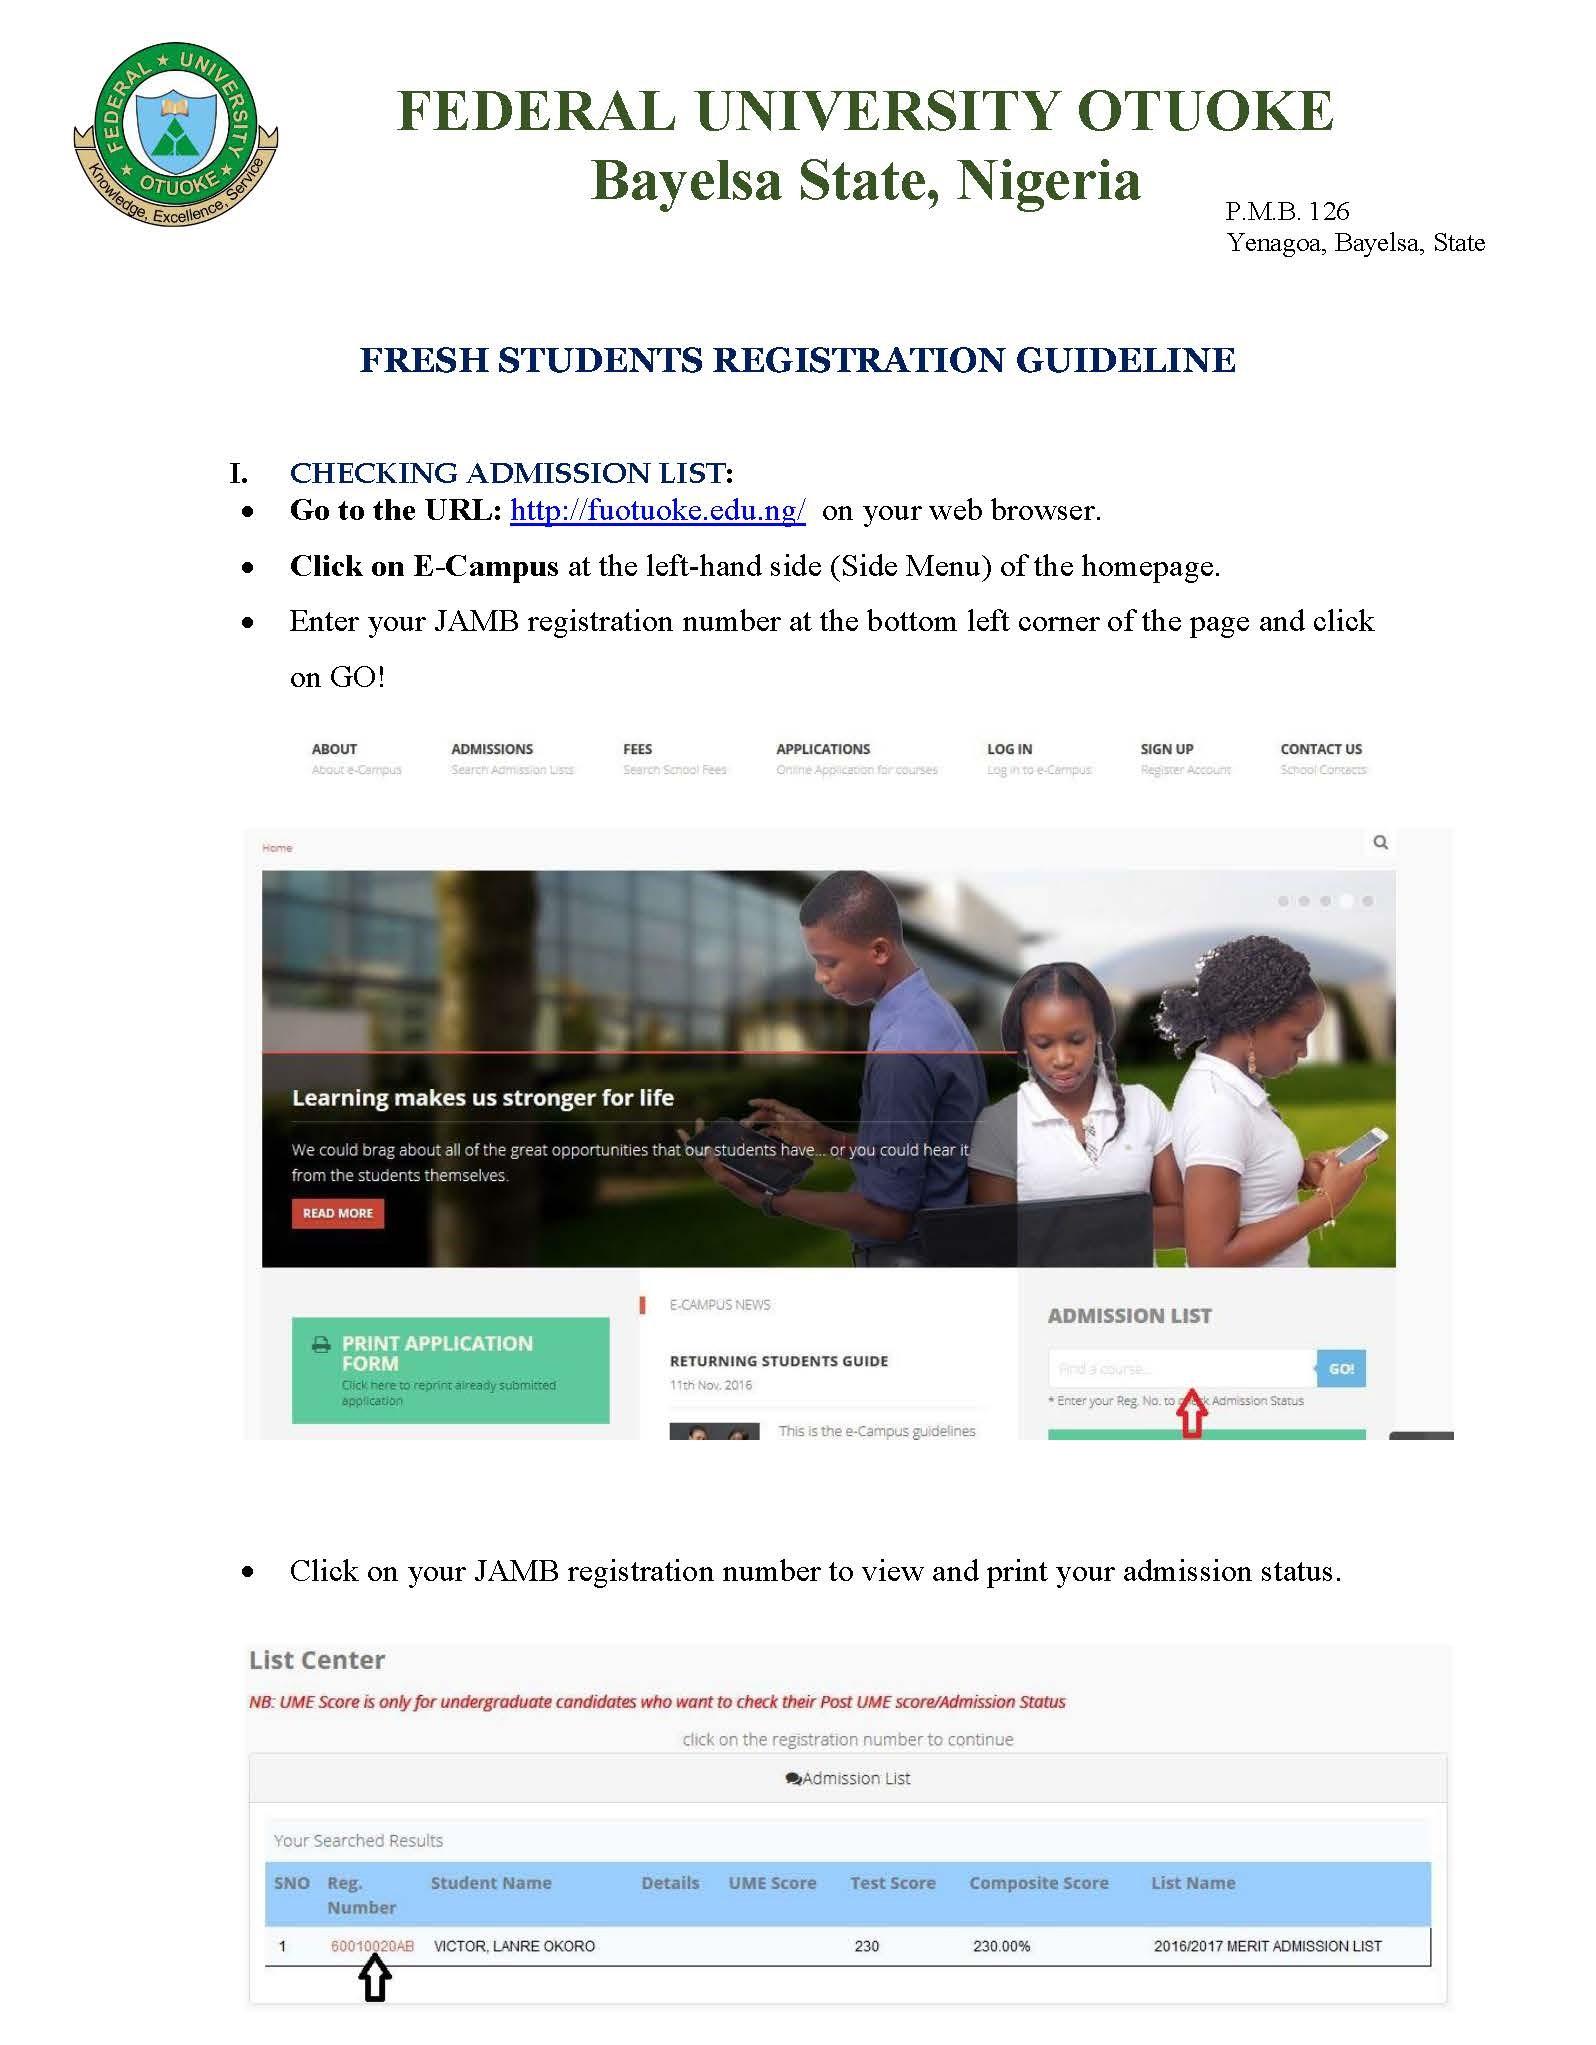 FUOTUOKE Fresh Students Registration Procedure - 2016/2017